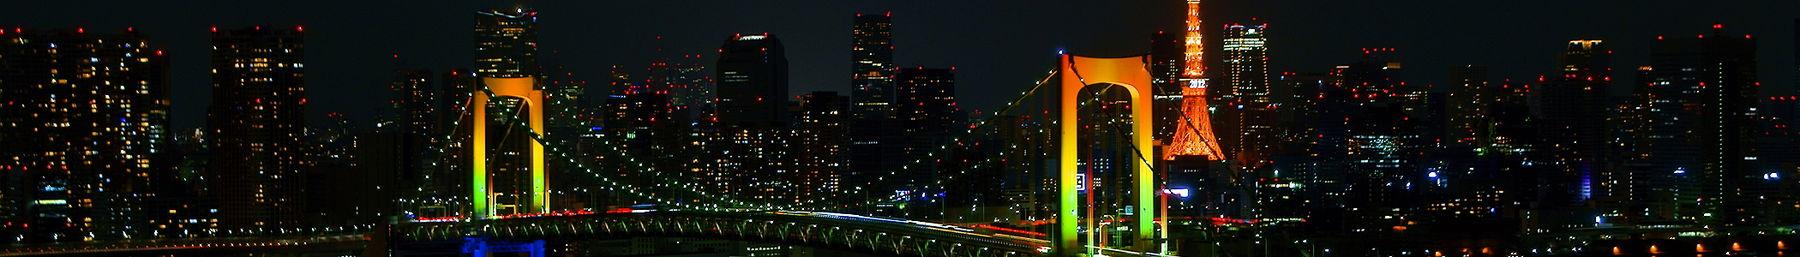 Tokyo night banner.JPG